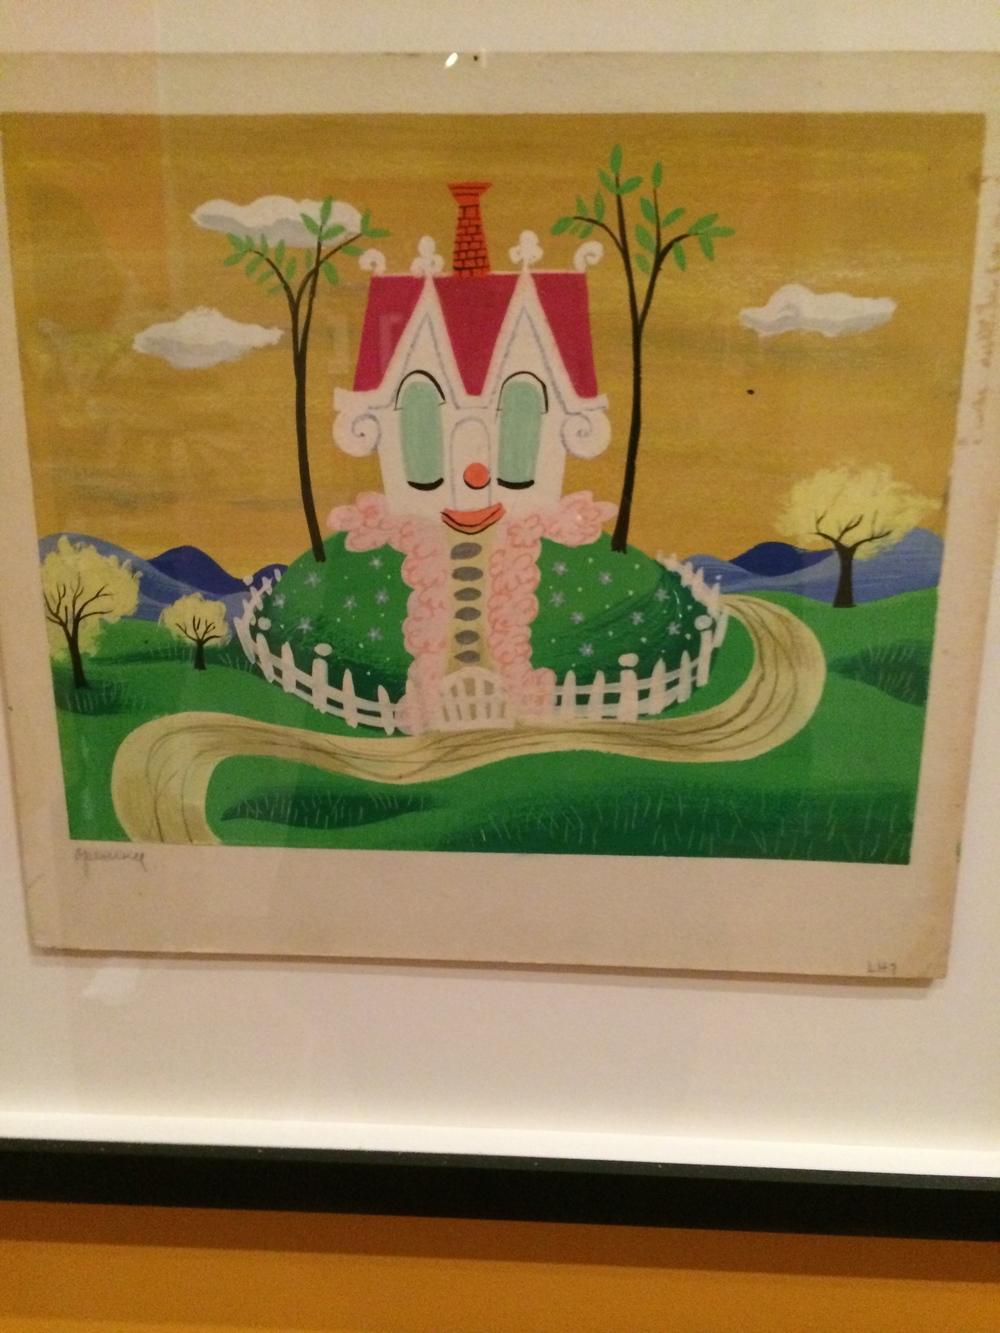 Visual development - The Little House (1946)